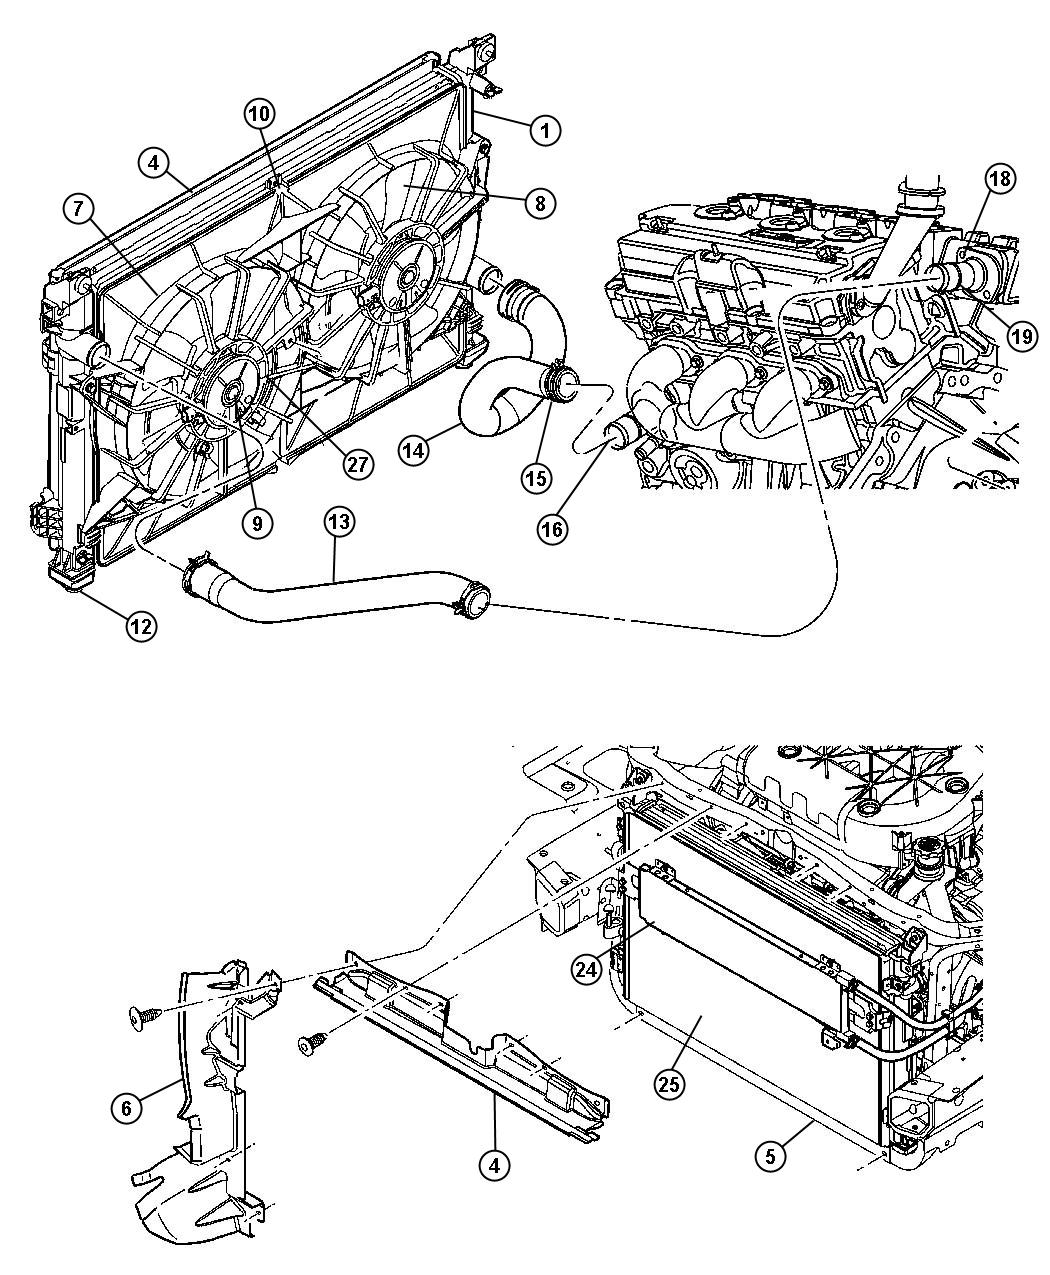 1992 dodge caravan fuse box diagram